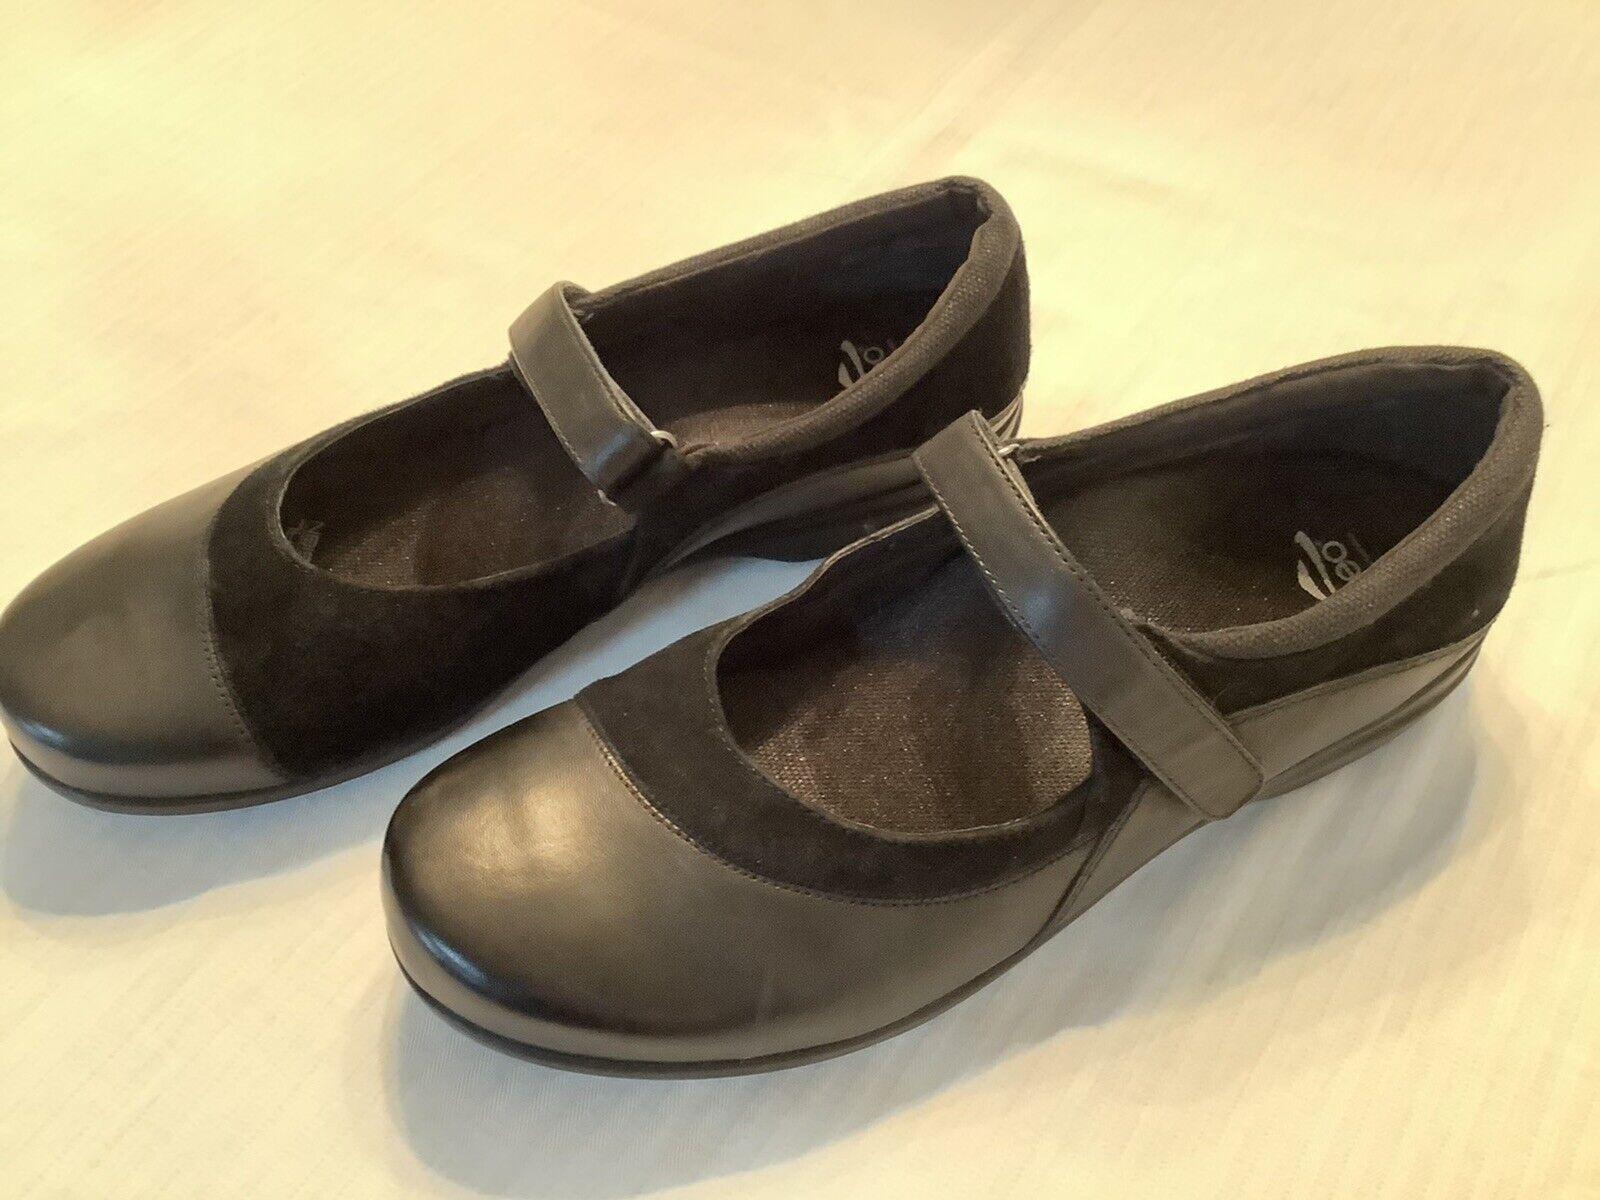 Abeo Ladies Sz 10 M Black Leather Suede Mary Janes